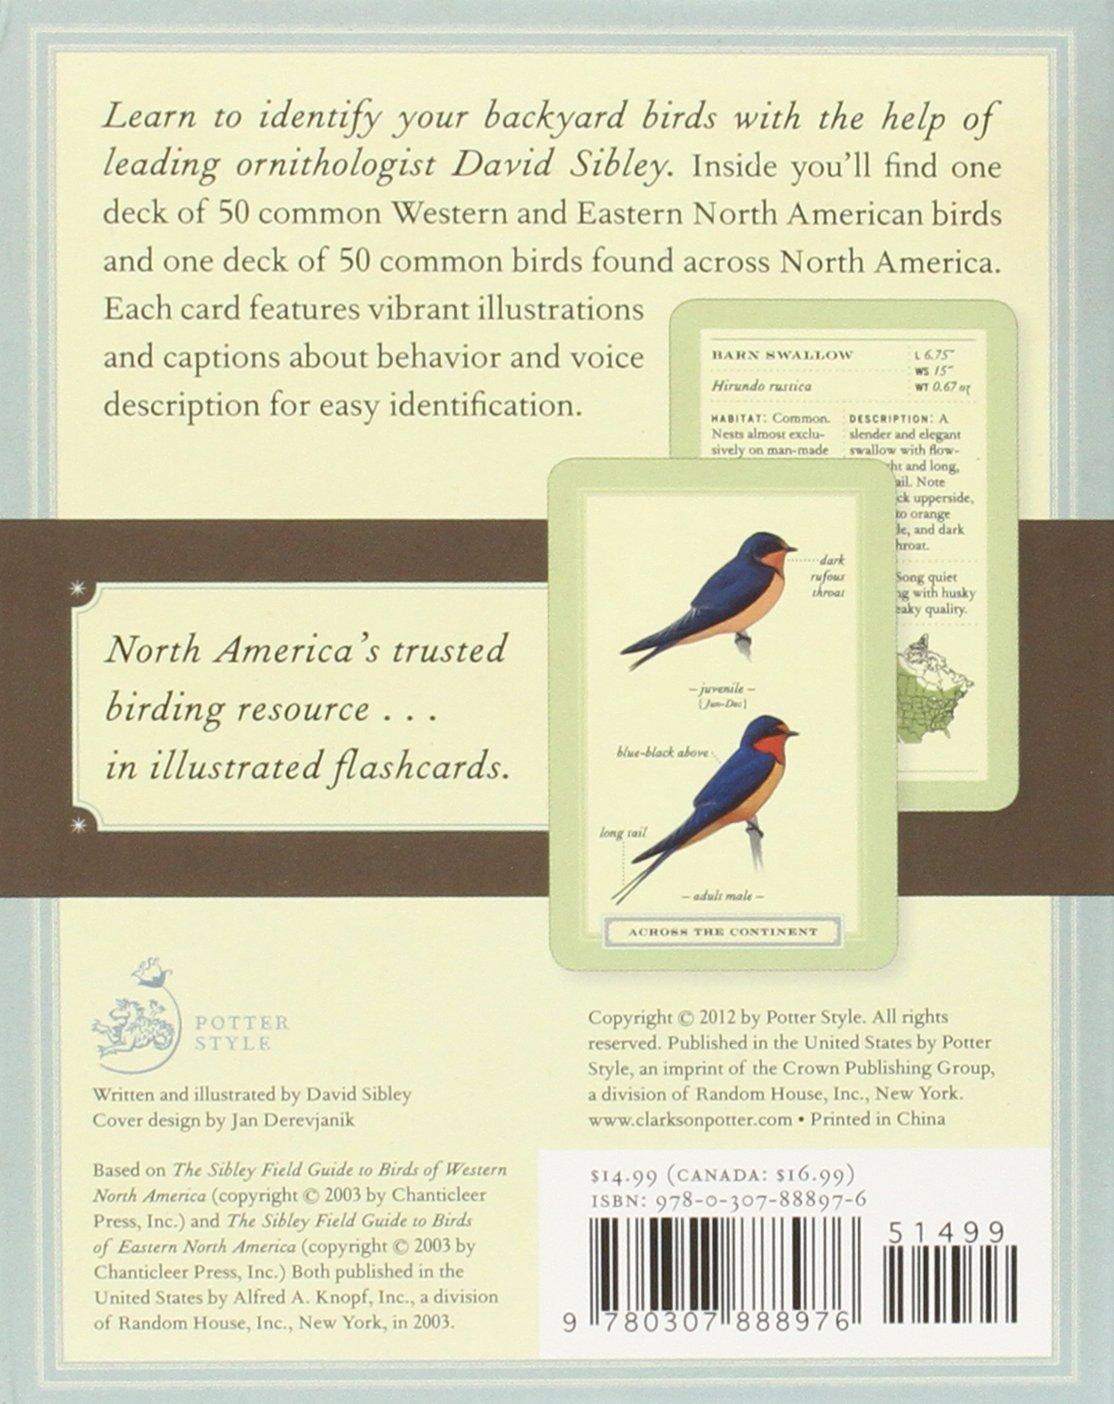 sibley backyard birding flashcards 100 common birds of eastern